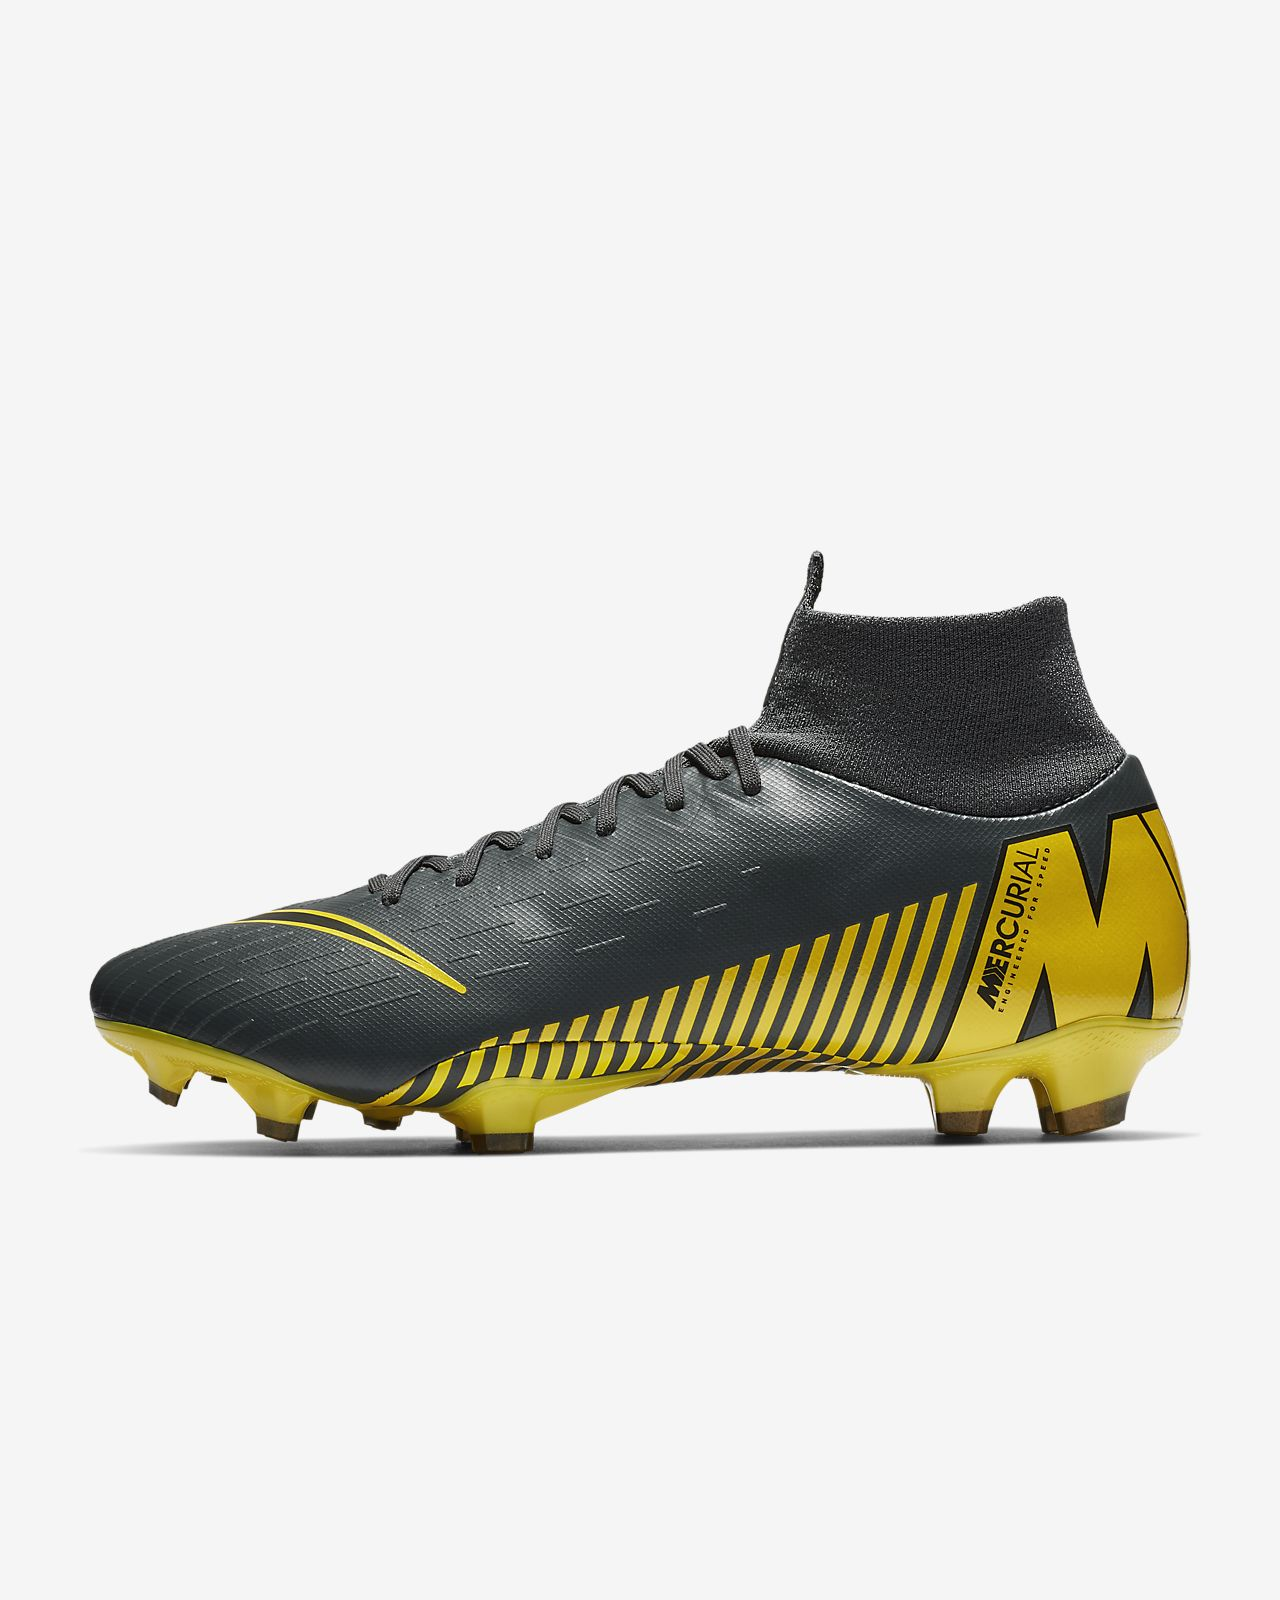 Nike Superfly 6 Pro FG Botes de futbol per a terreny ferm